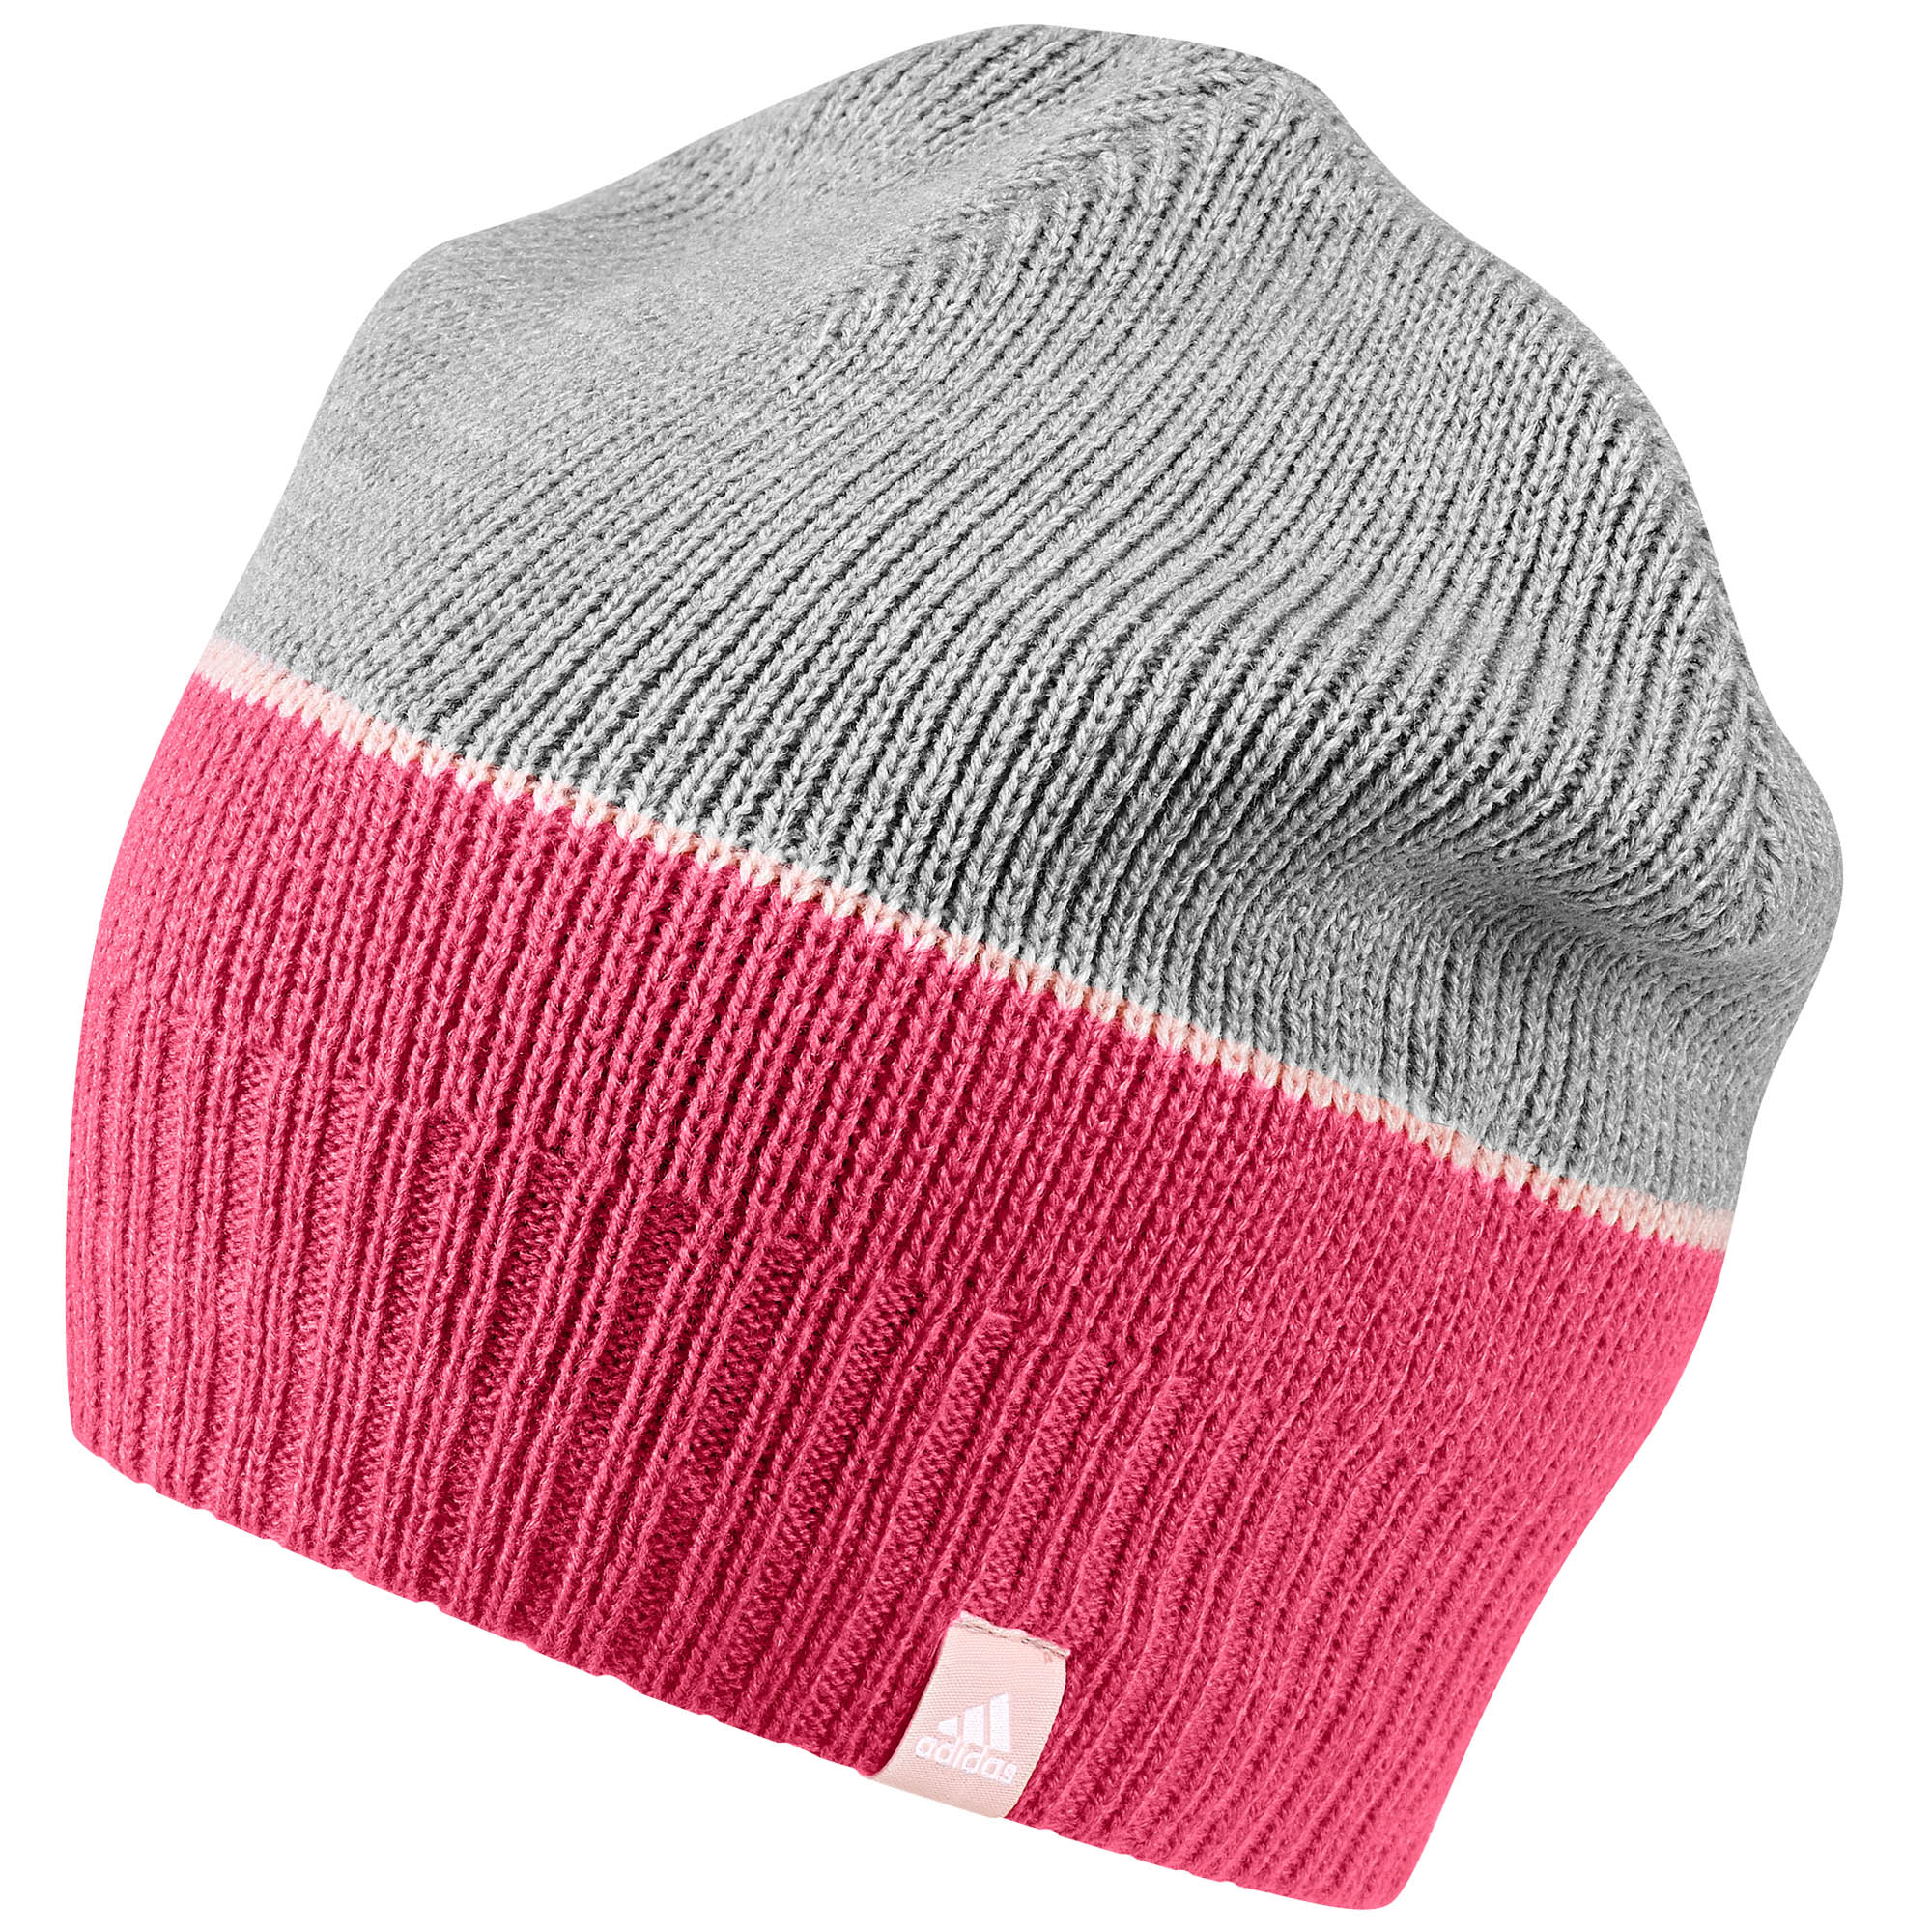 Adidas Mütze pink grau